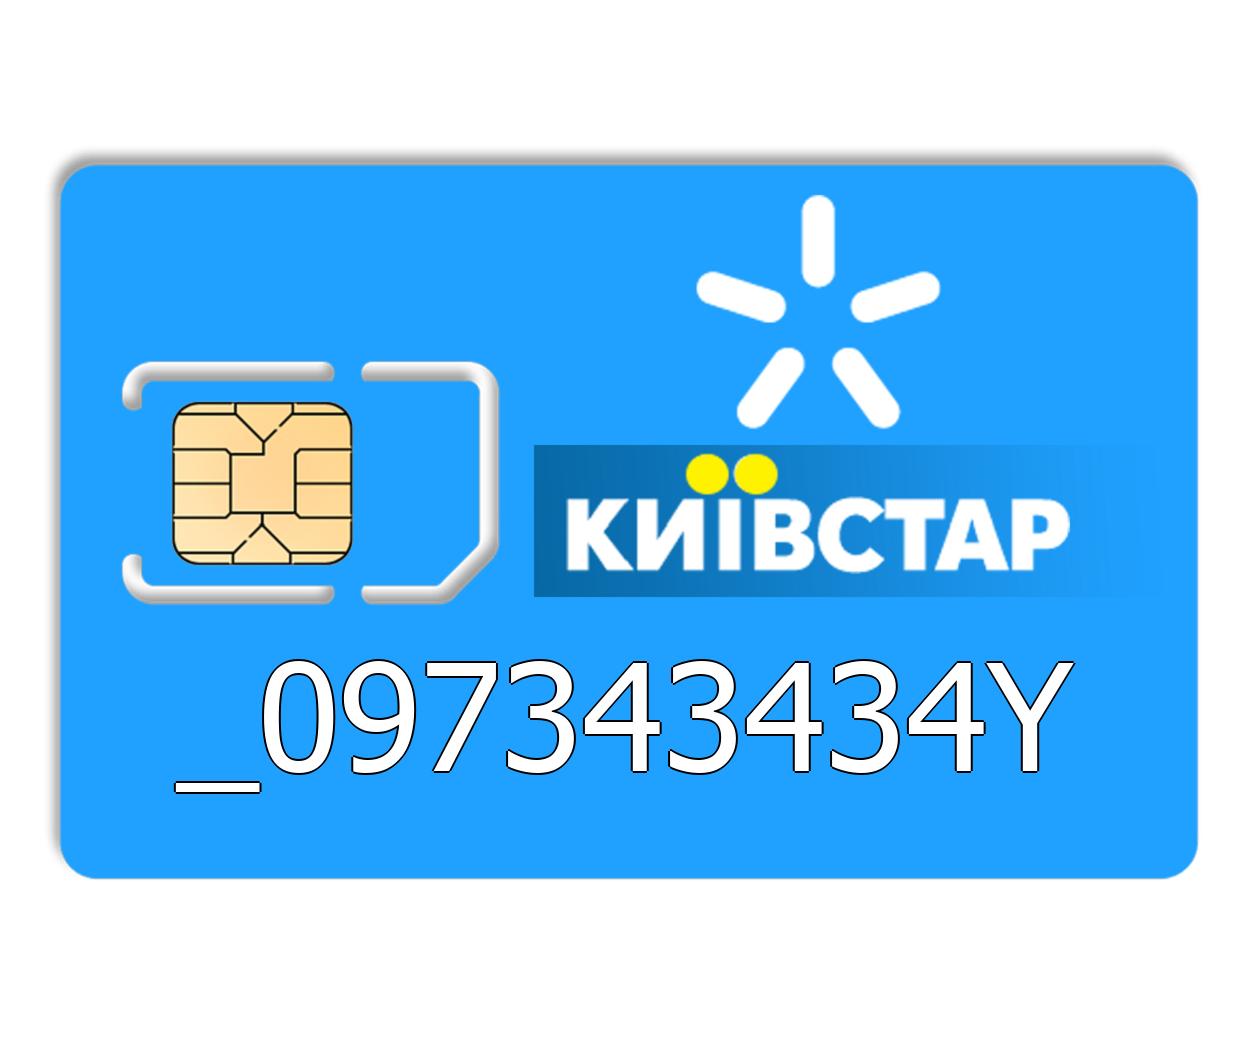 Красивий номер Київстар 097343434Y